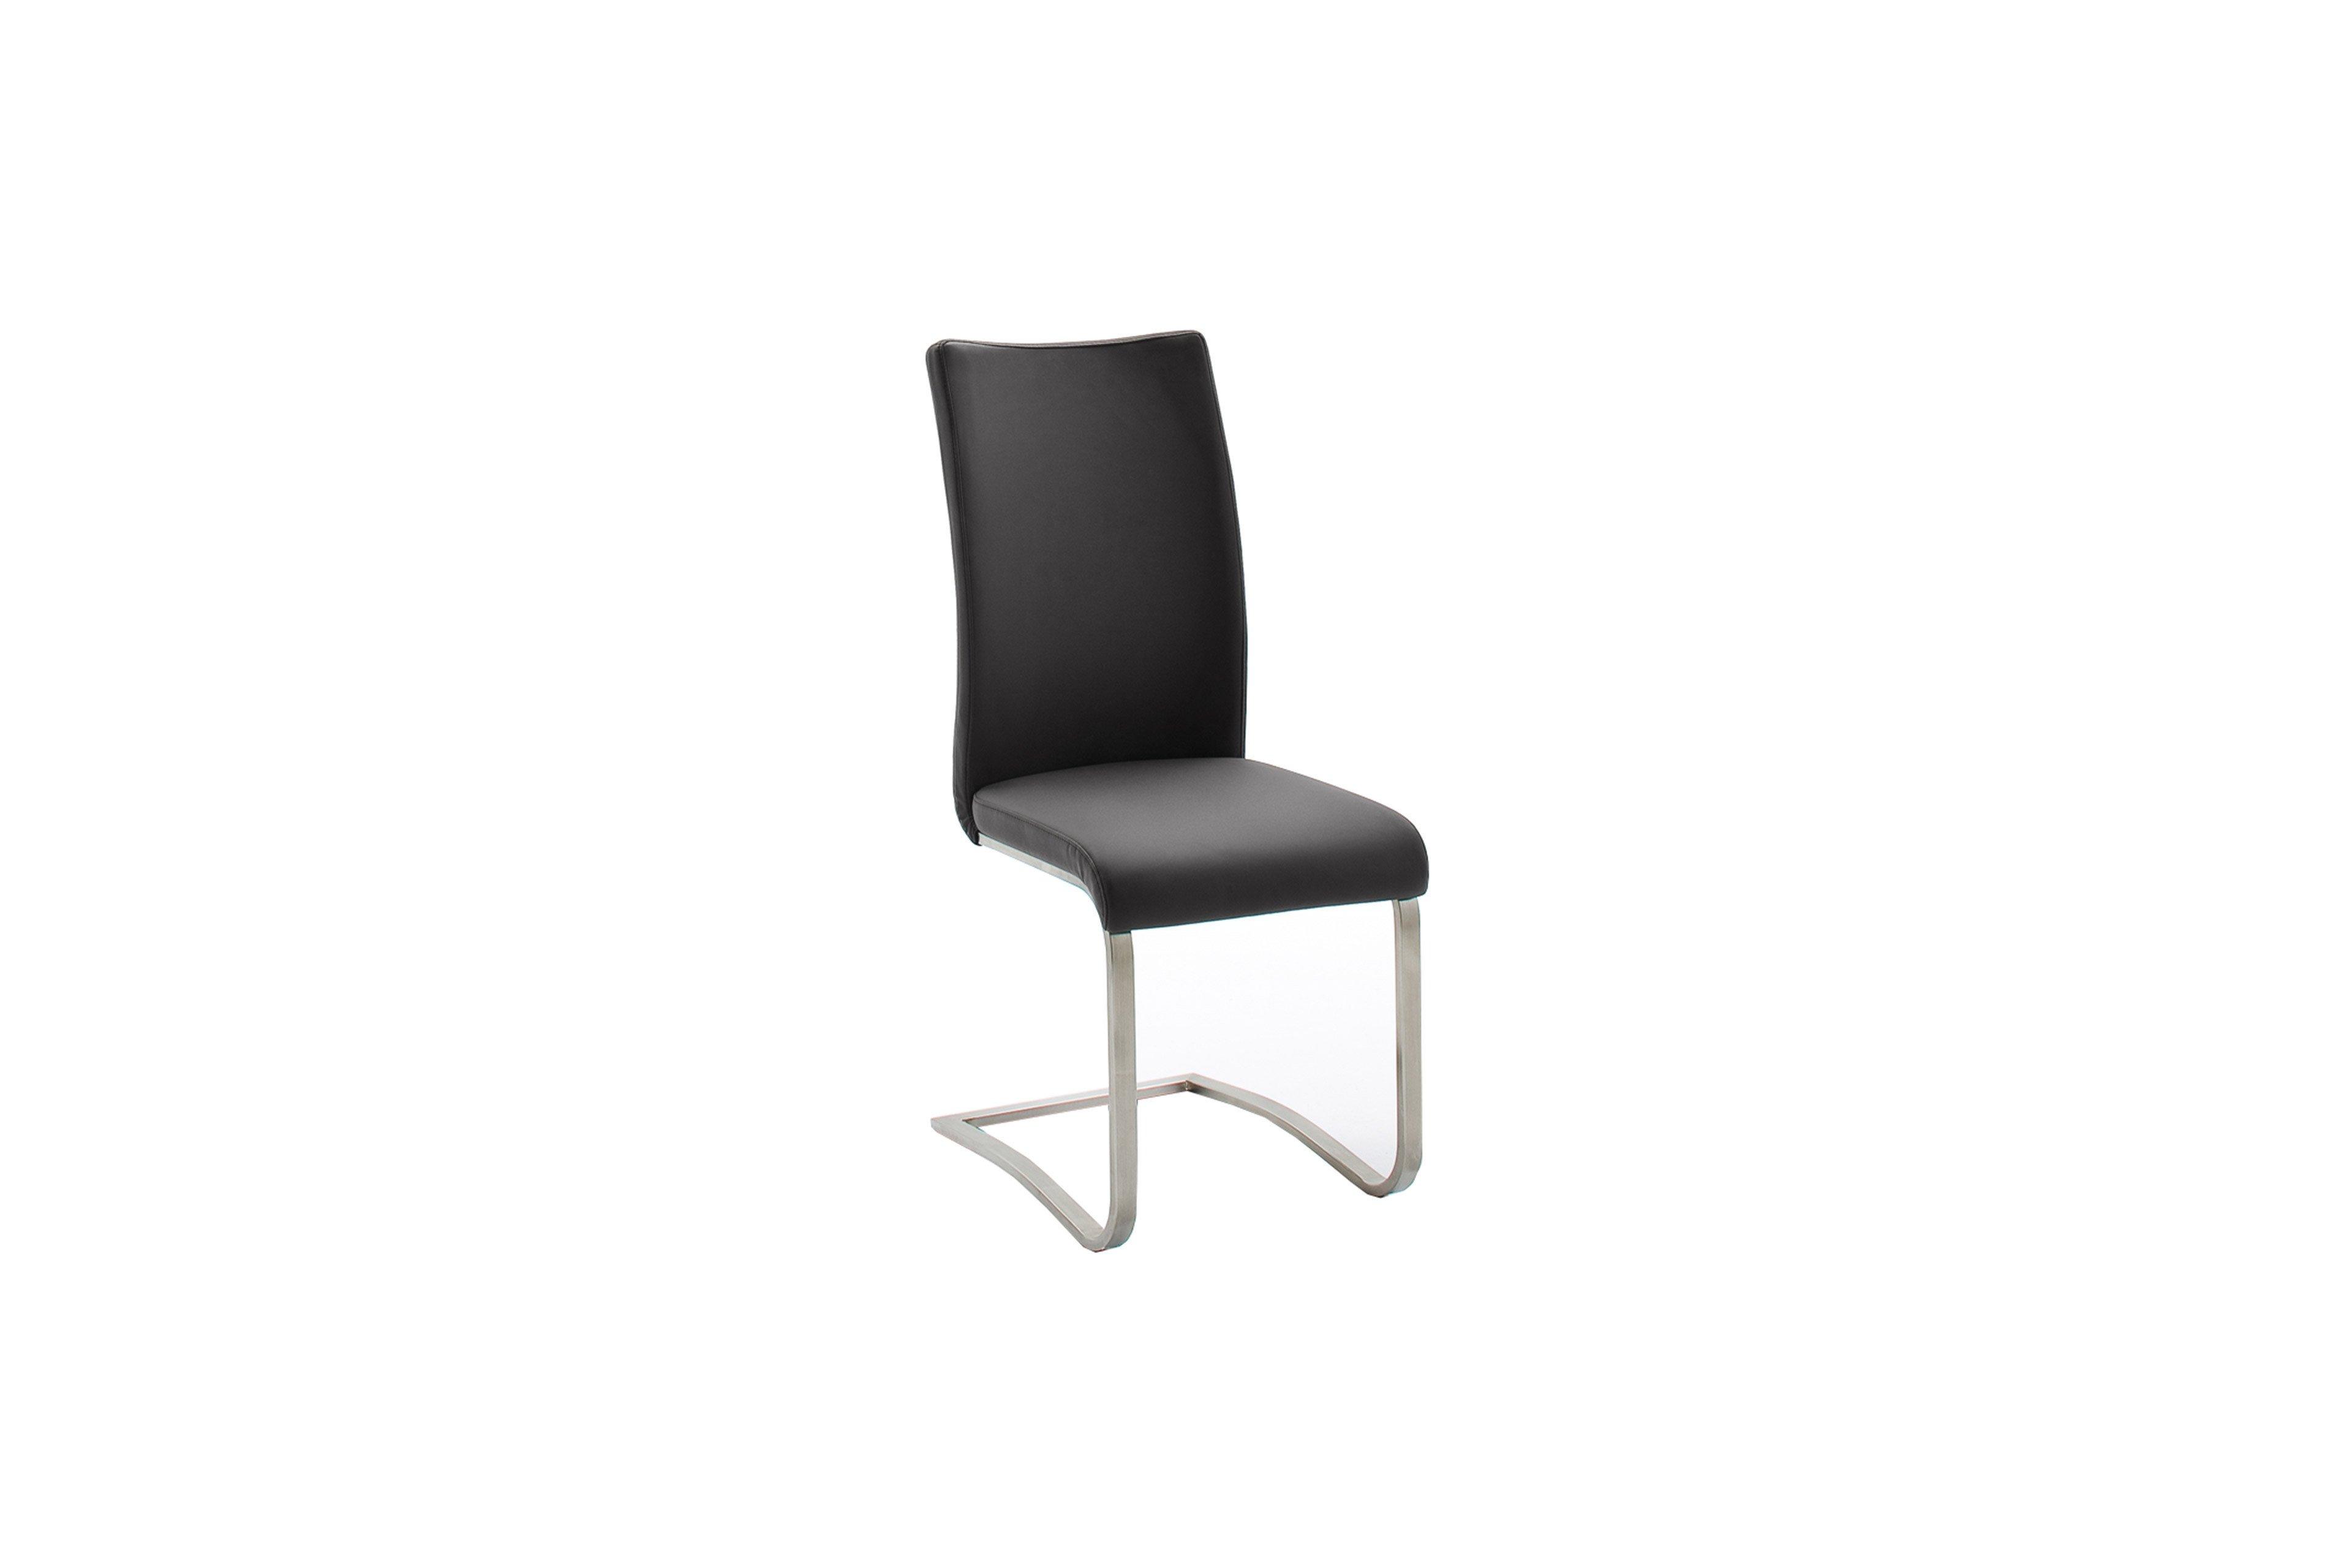 Stuhl Arco von MCA furniture in Kunstleder/ Edelstahl | Möbel Letz ...